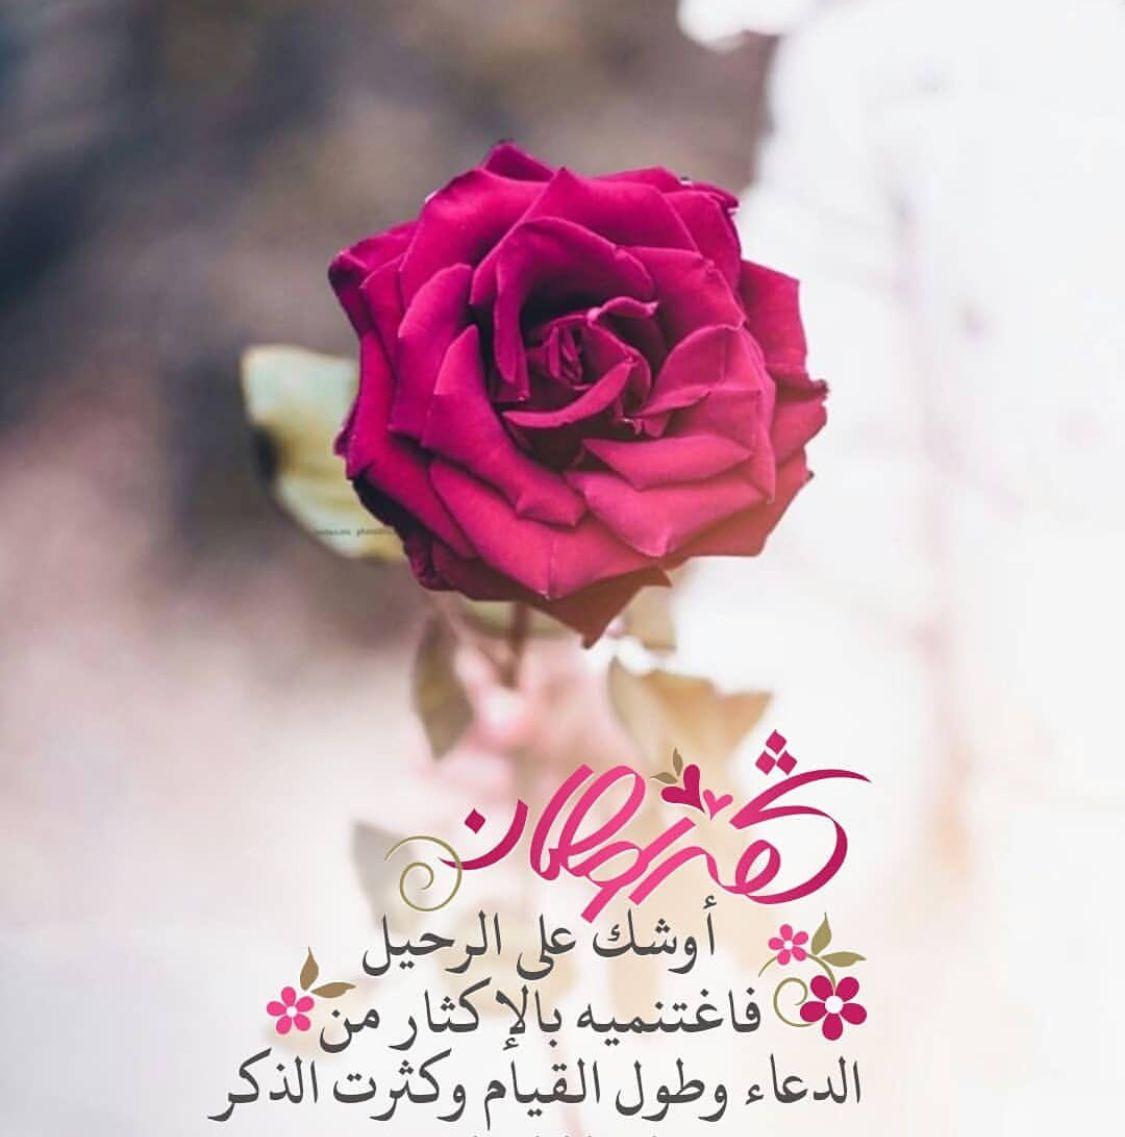 Pin By صورة و كلمة On رمضان كريم Ramadan Kareem Ramadan Flowers Ramadan Mubarak